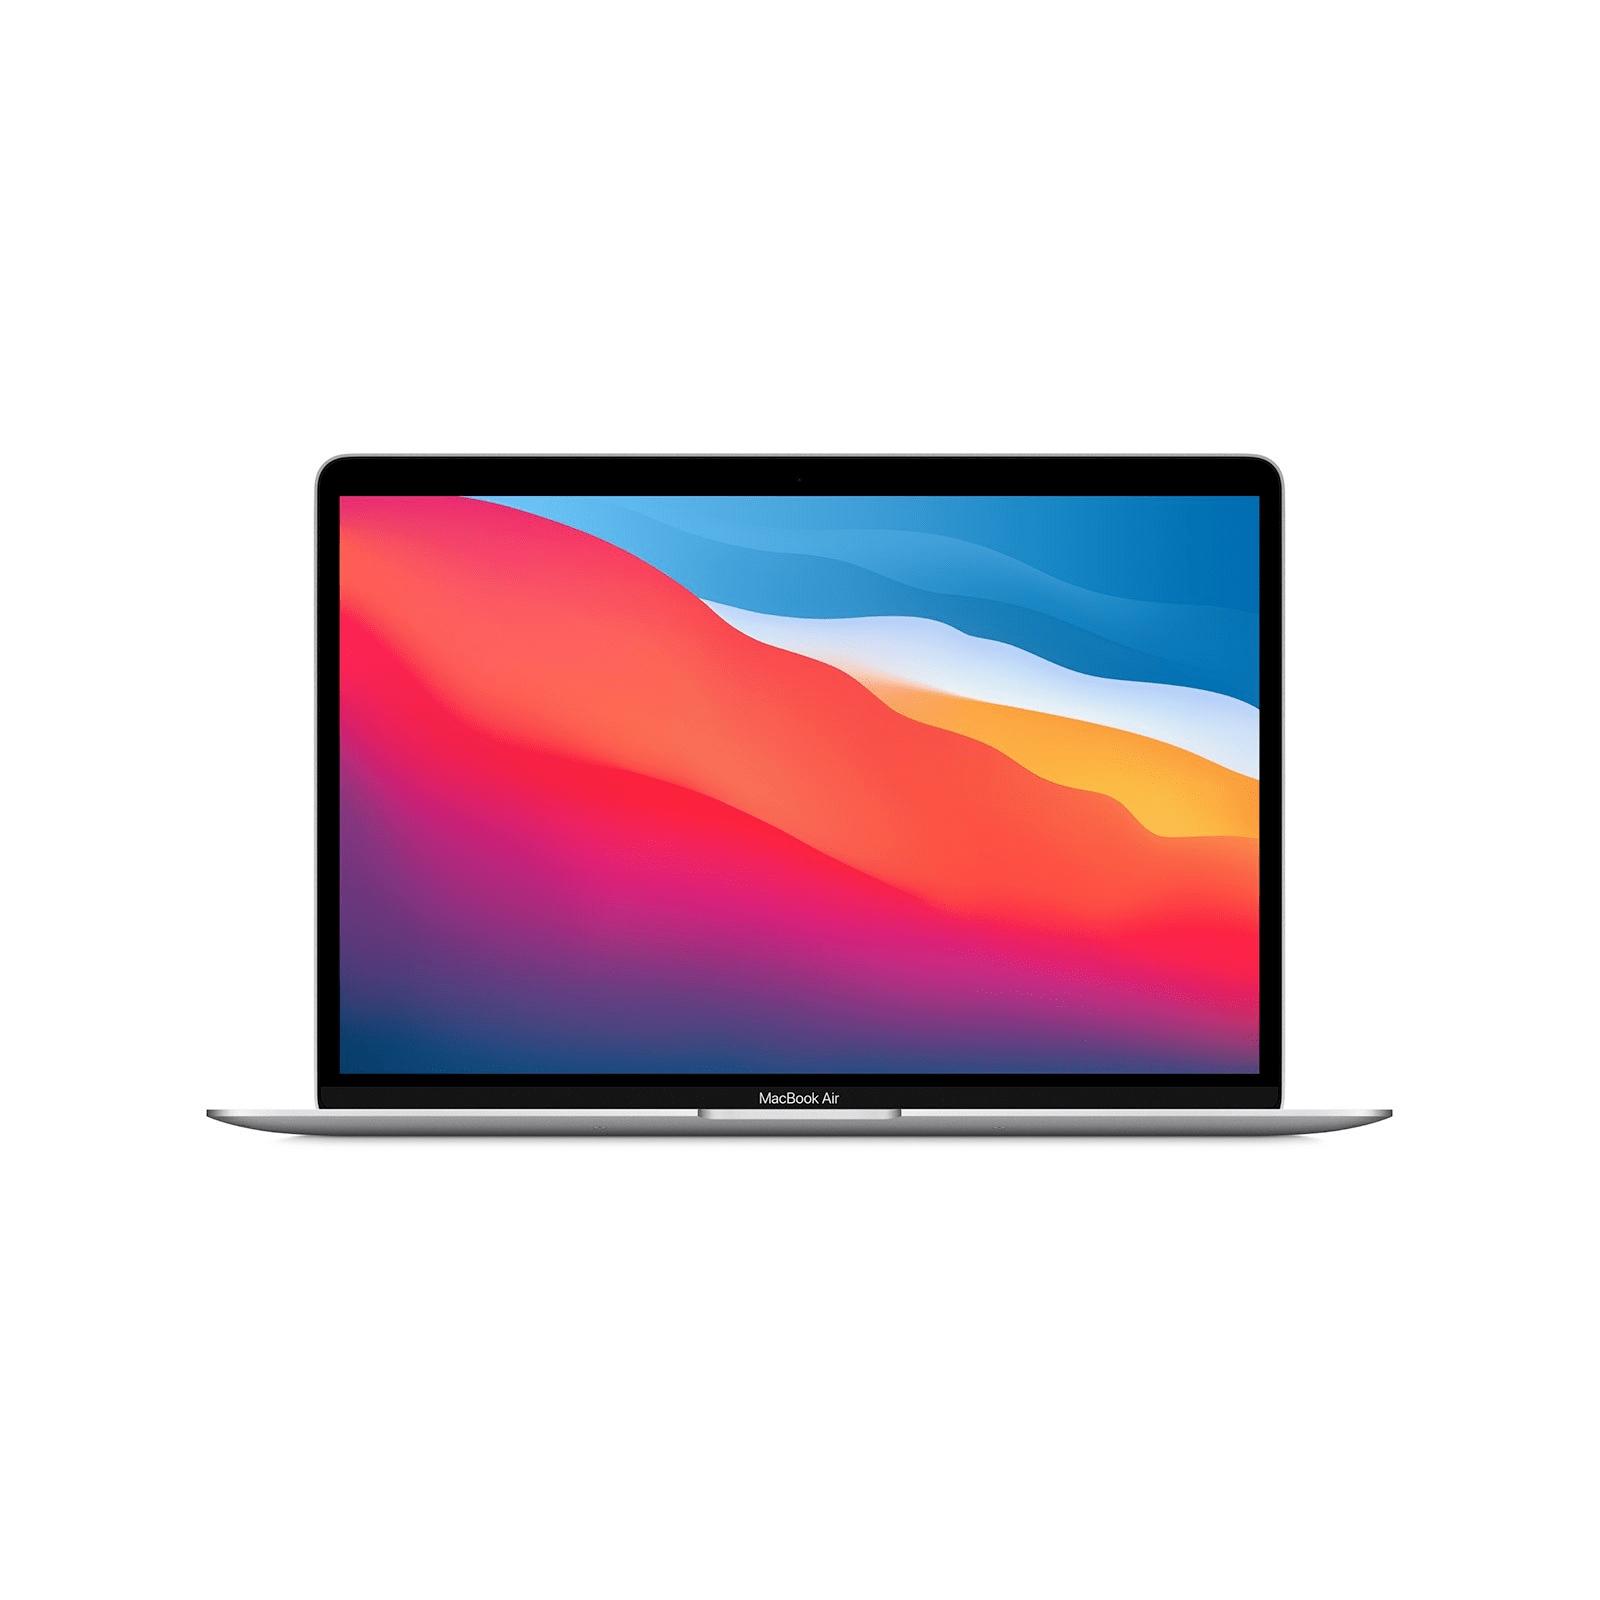 13-inch MacBook Air | Apple M1 chip | 512GB - Silver